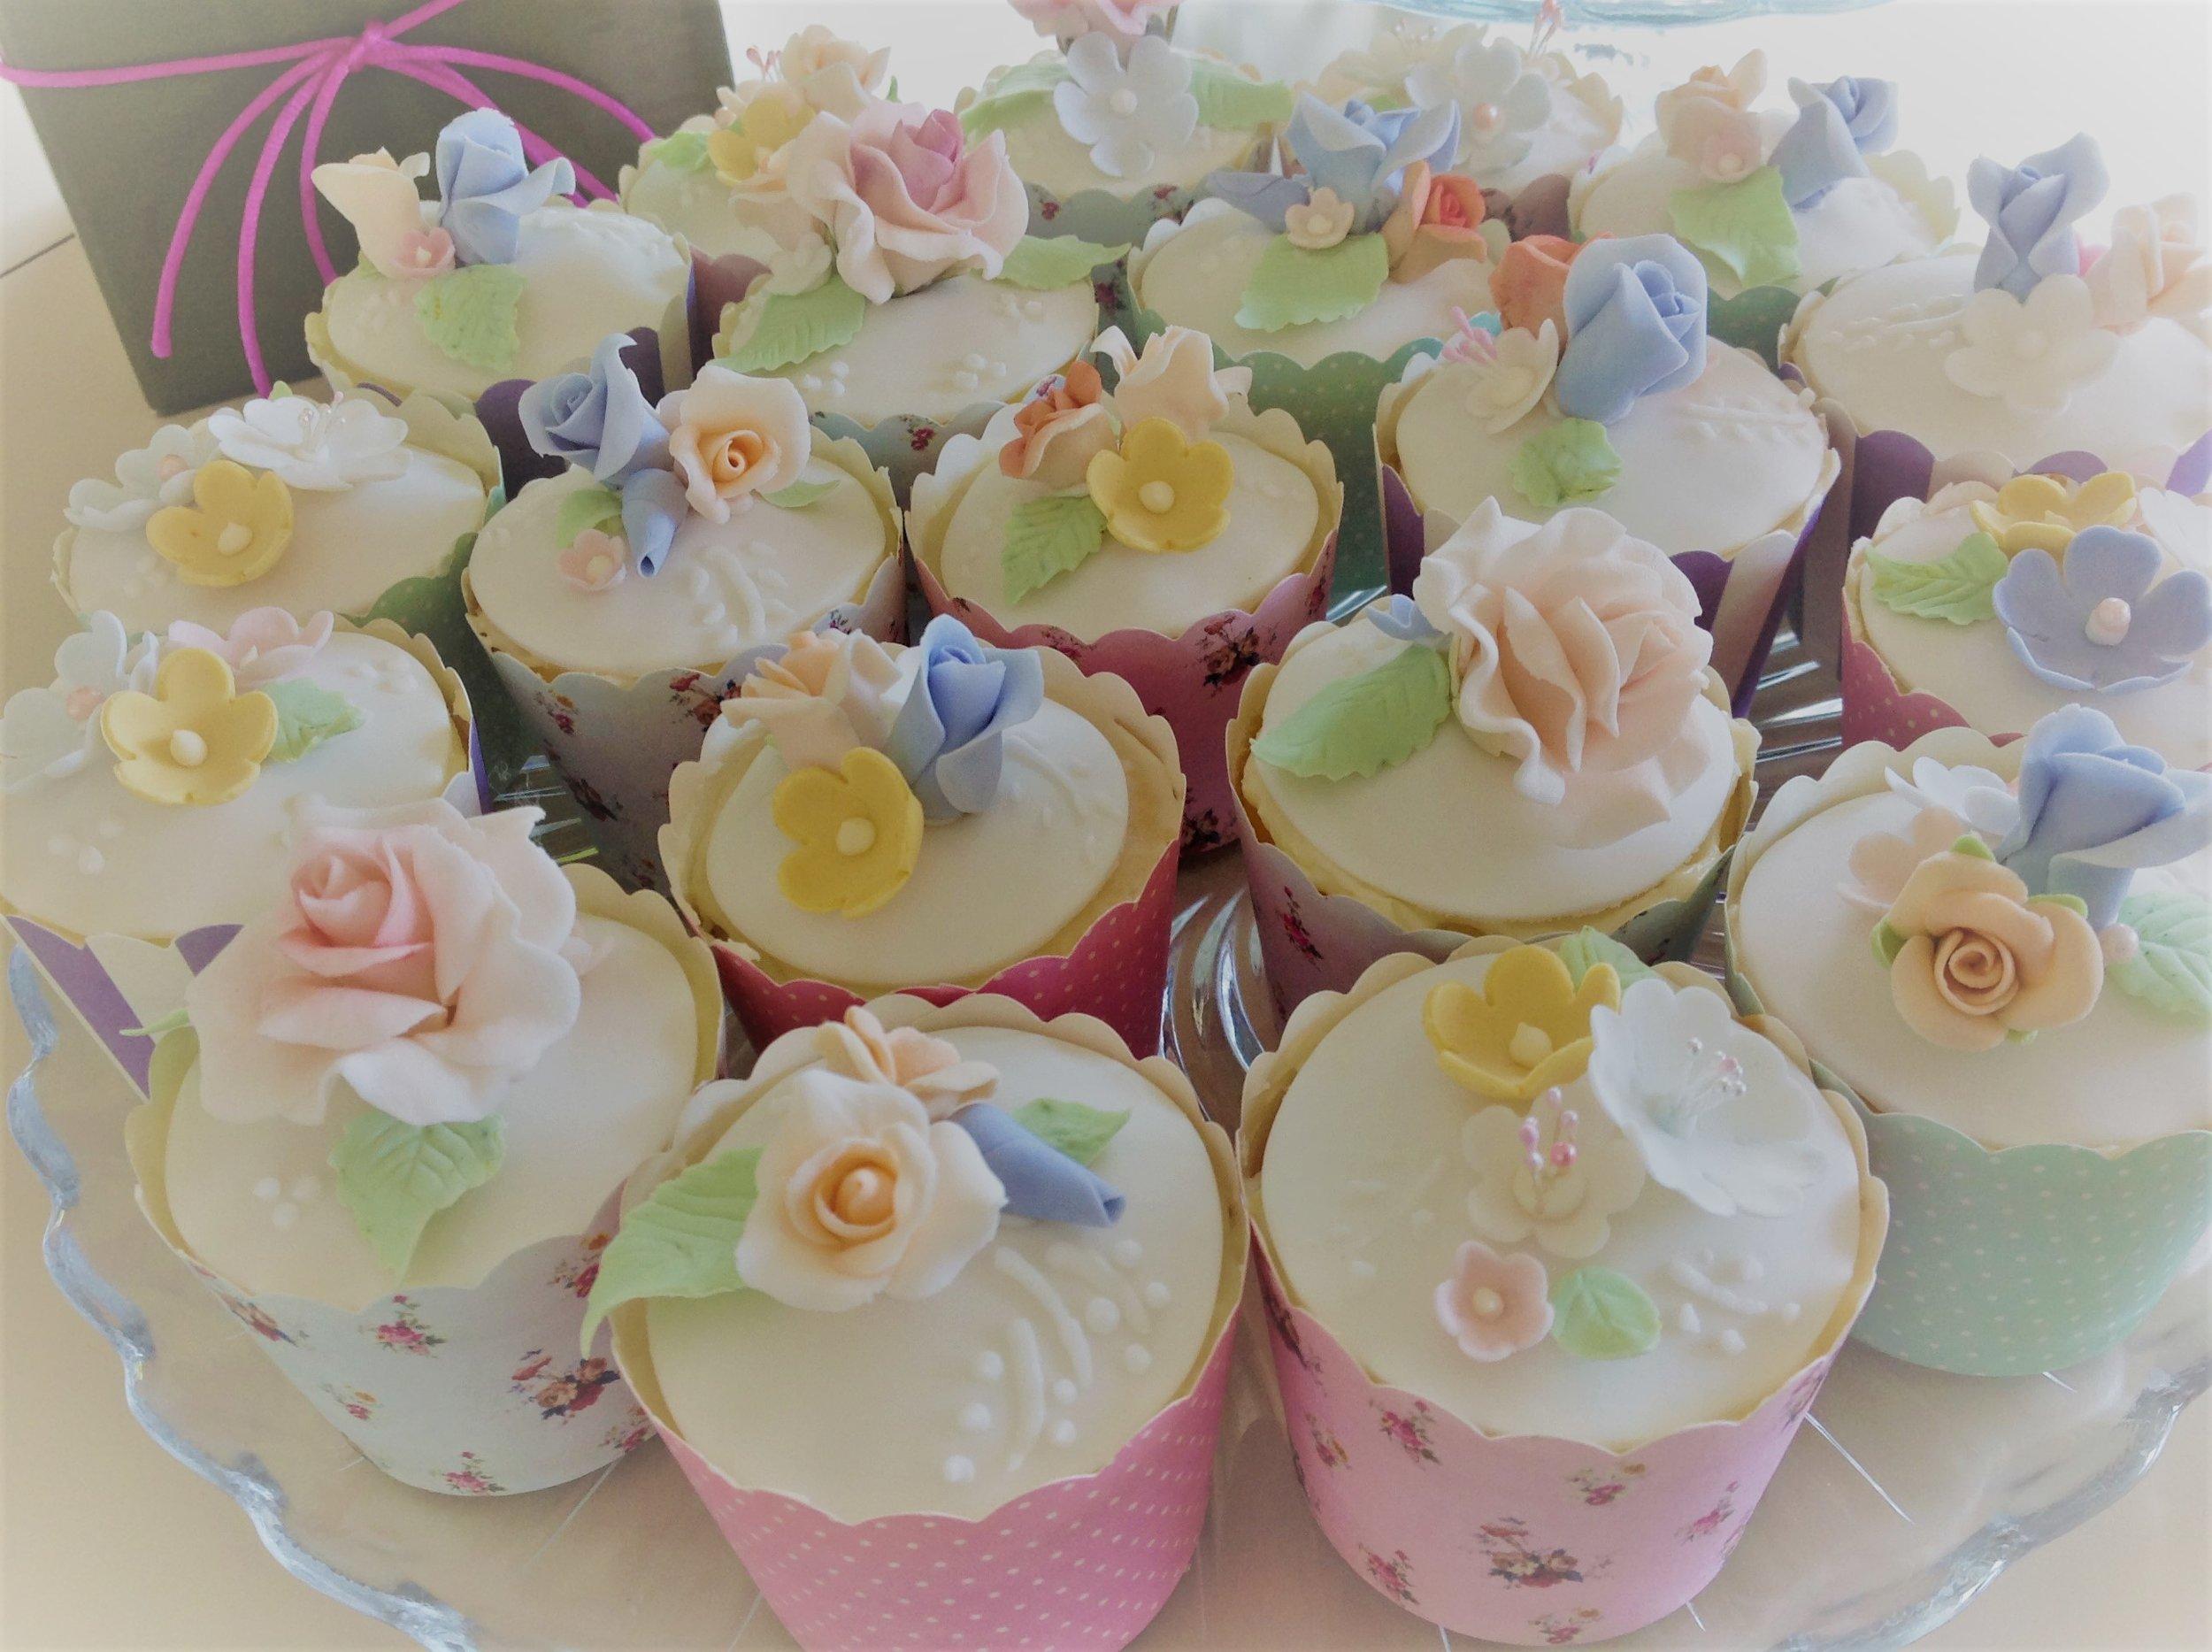 Cupcakes High tea Cakes (1).JPG